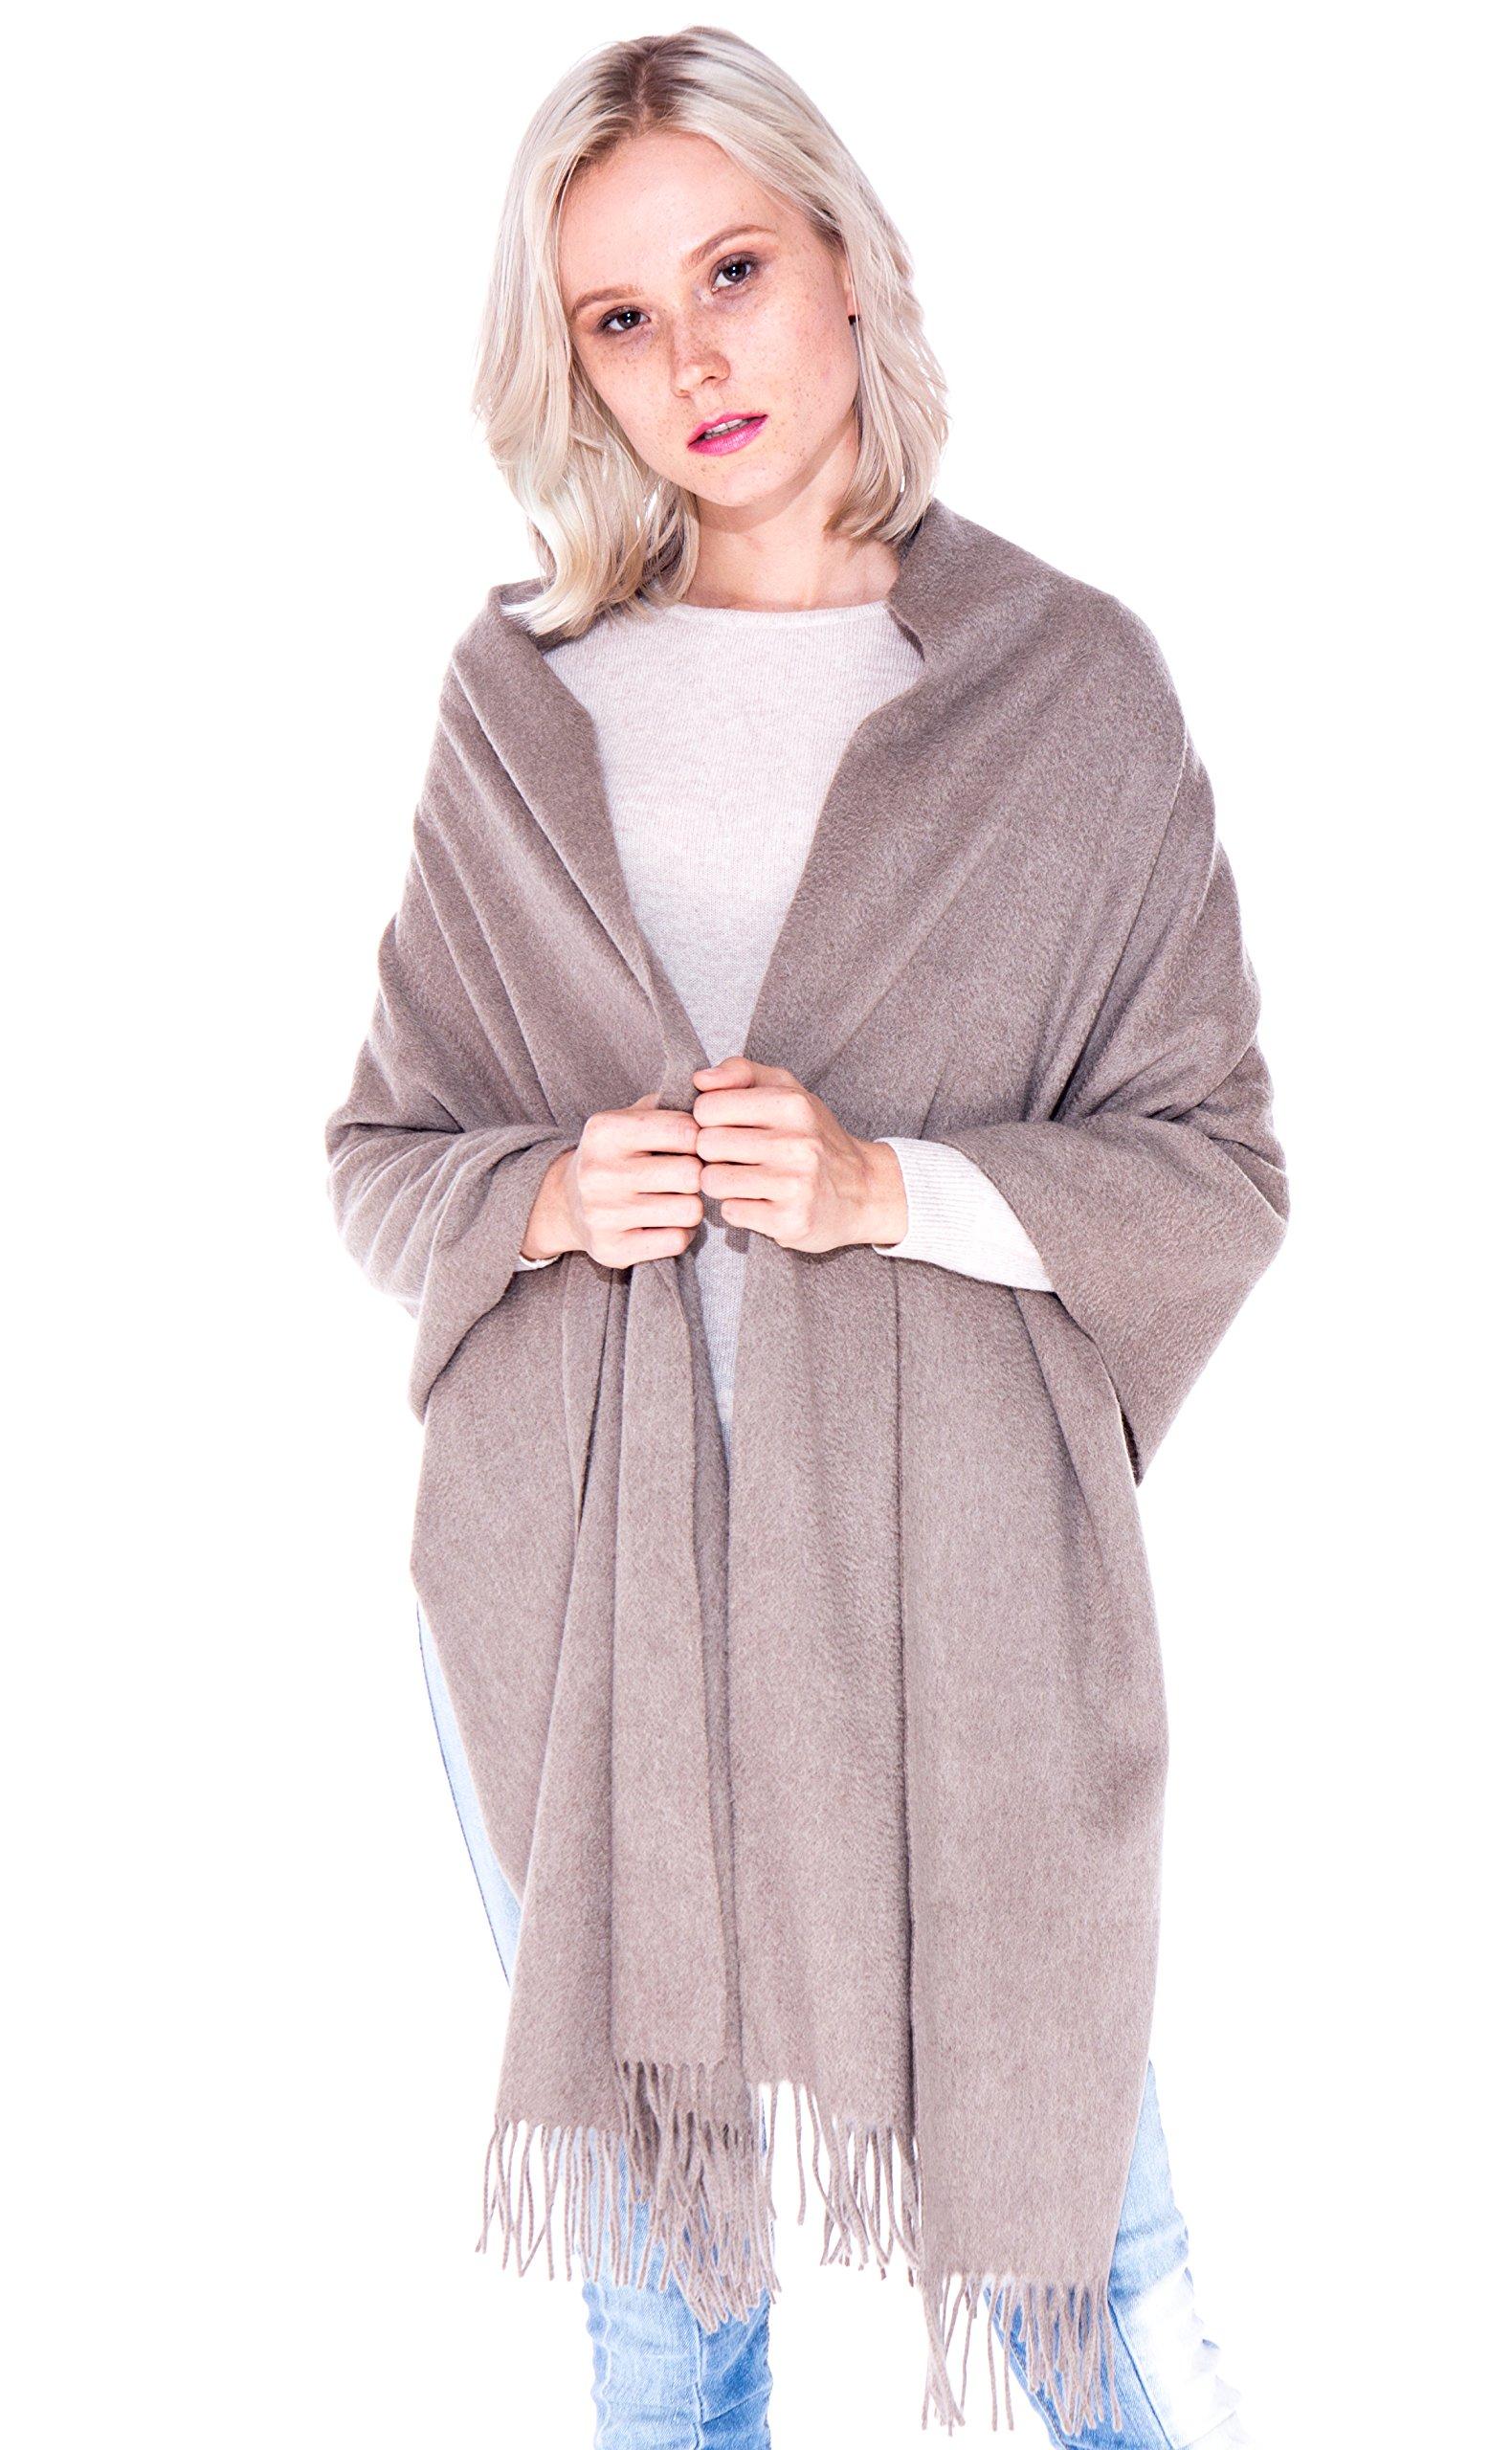 LEBAC 100% Cashmere Wrap Scarf Shawl With Fringes - Extra Large Super Soft & Warm Travel Throw Blanket